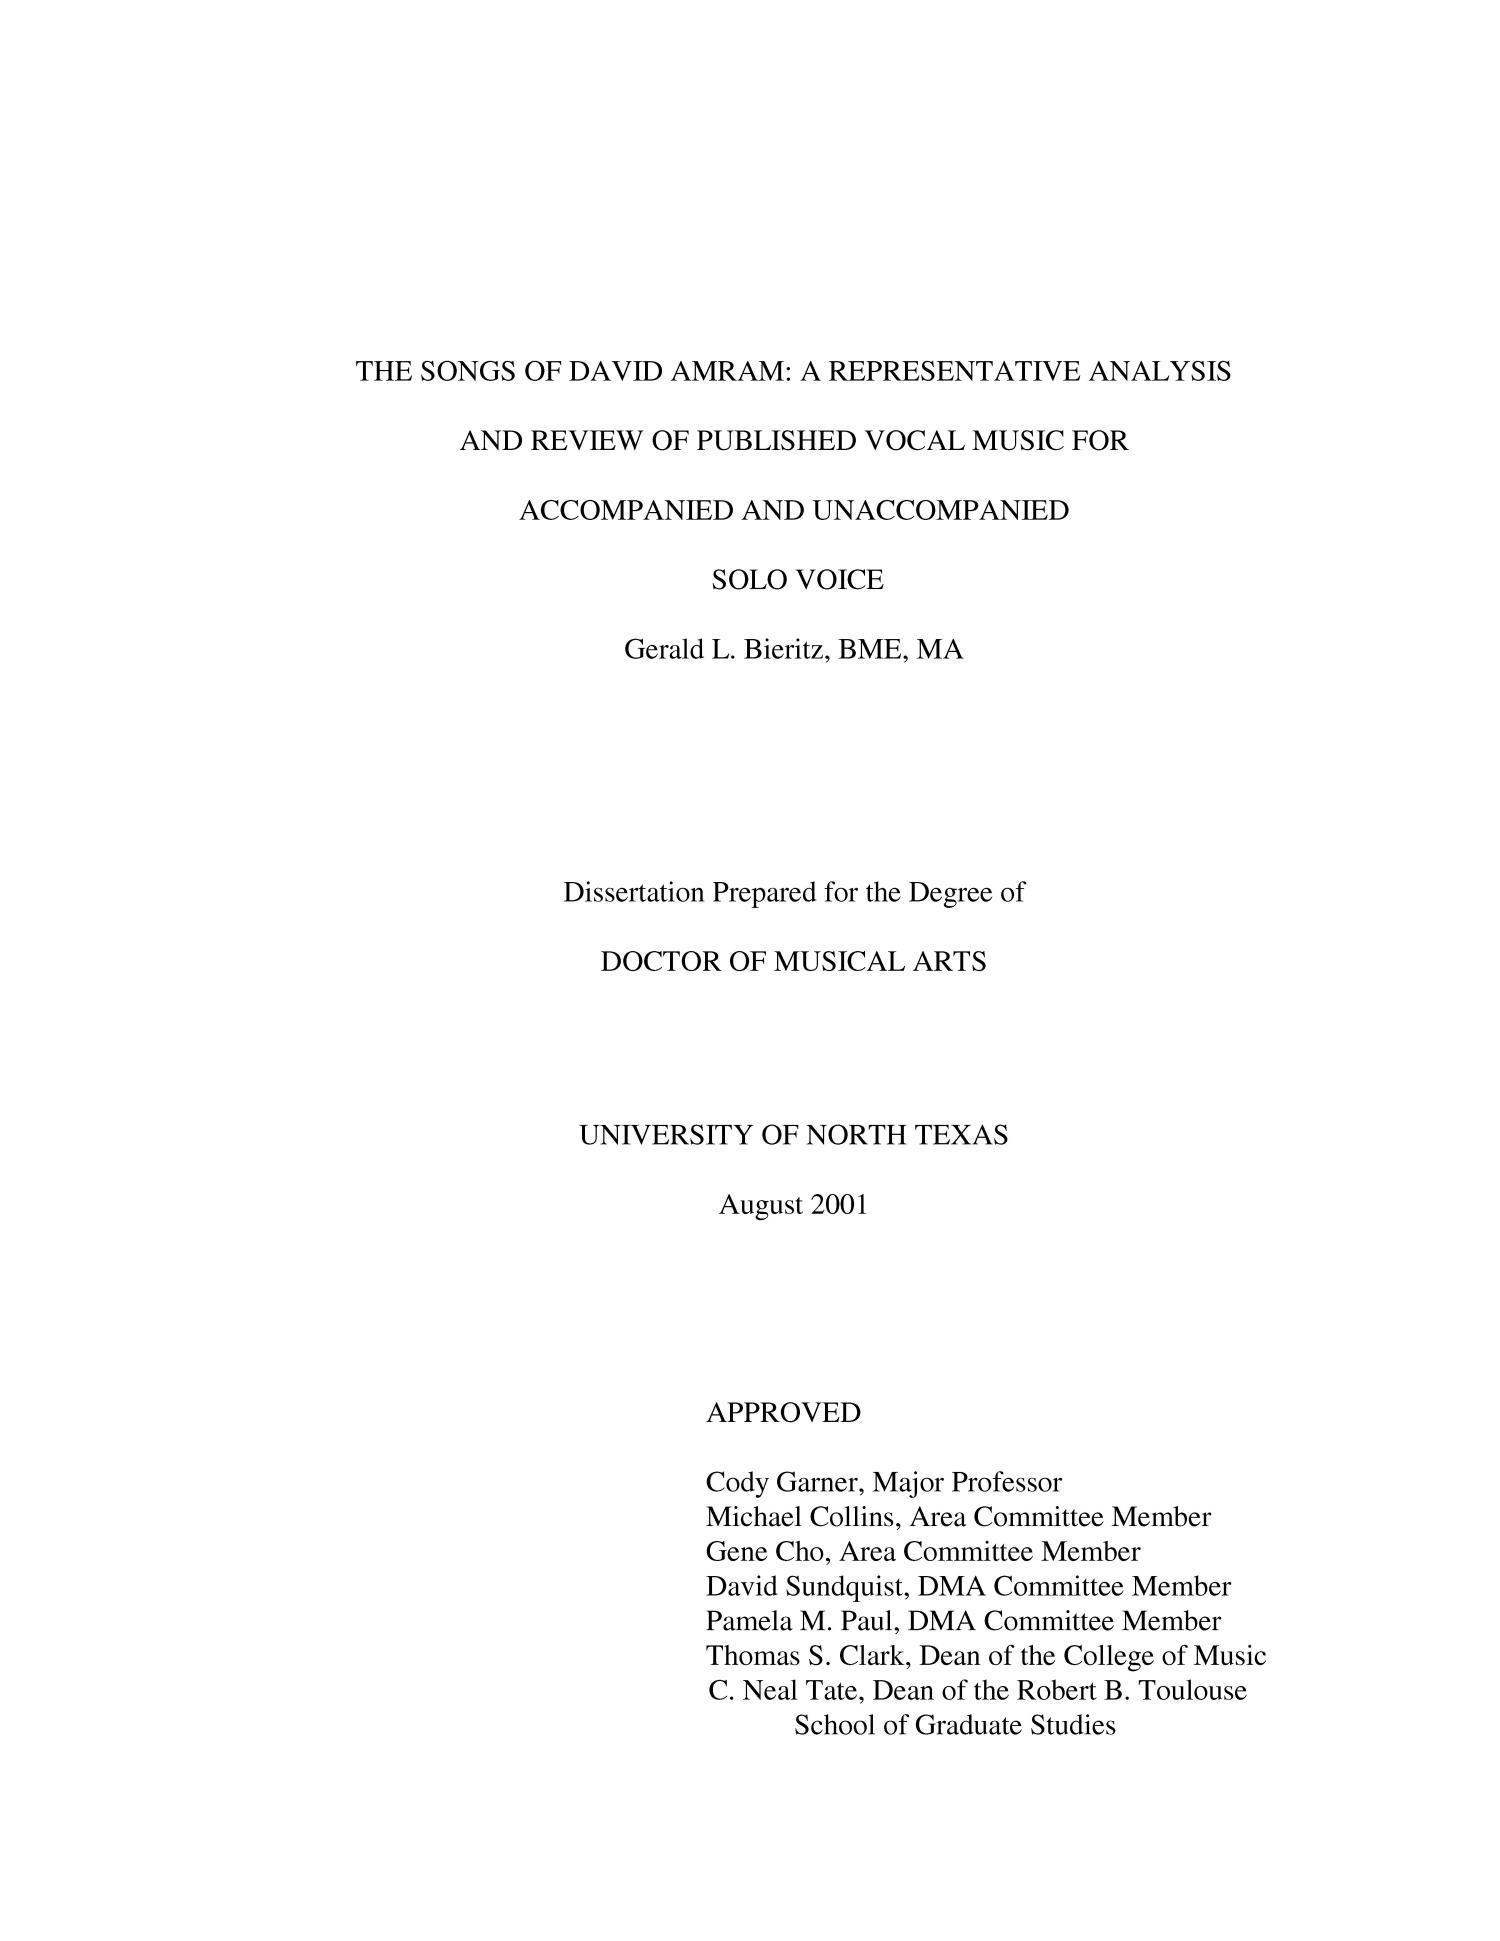 The Songs of David Amram: A representative analysis and